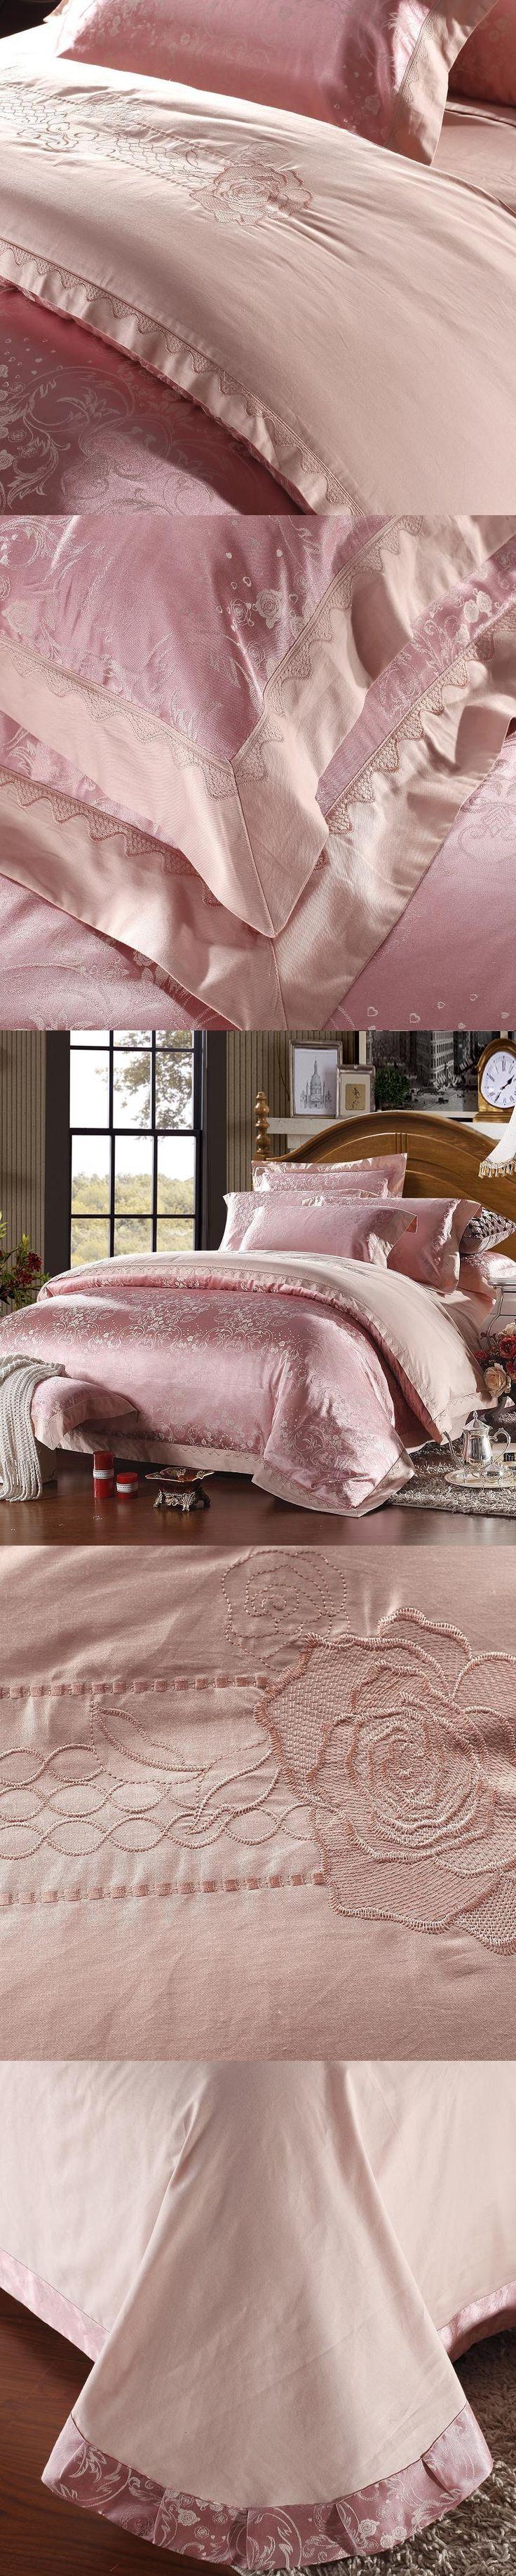 new Luxury Bedding Sets Jacquard Cotton 4pcs Queen/King Size Duvet Cover Set lace edge Bedclothes Bed Linen bed sheet